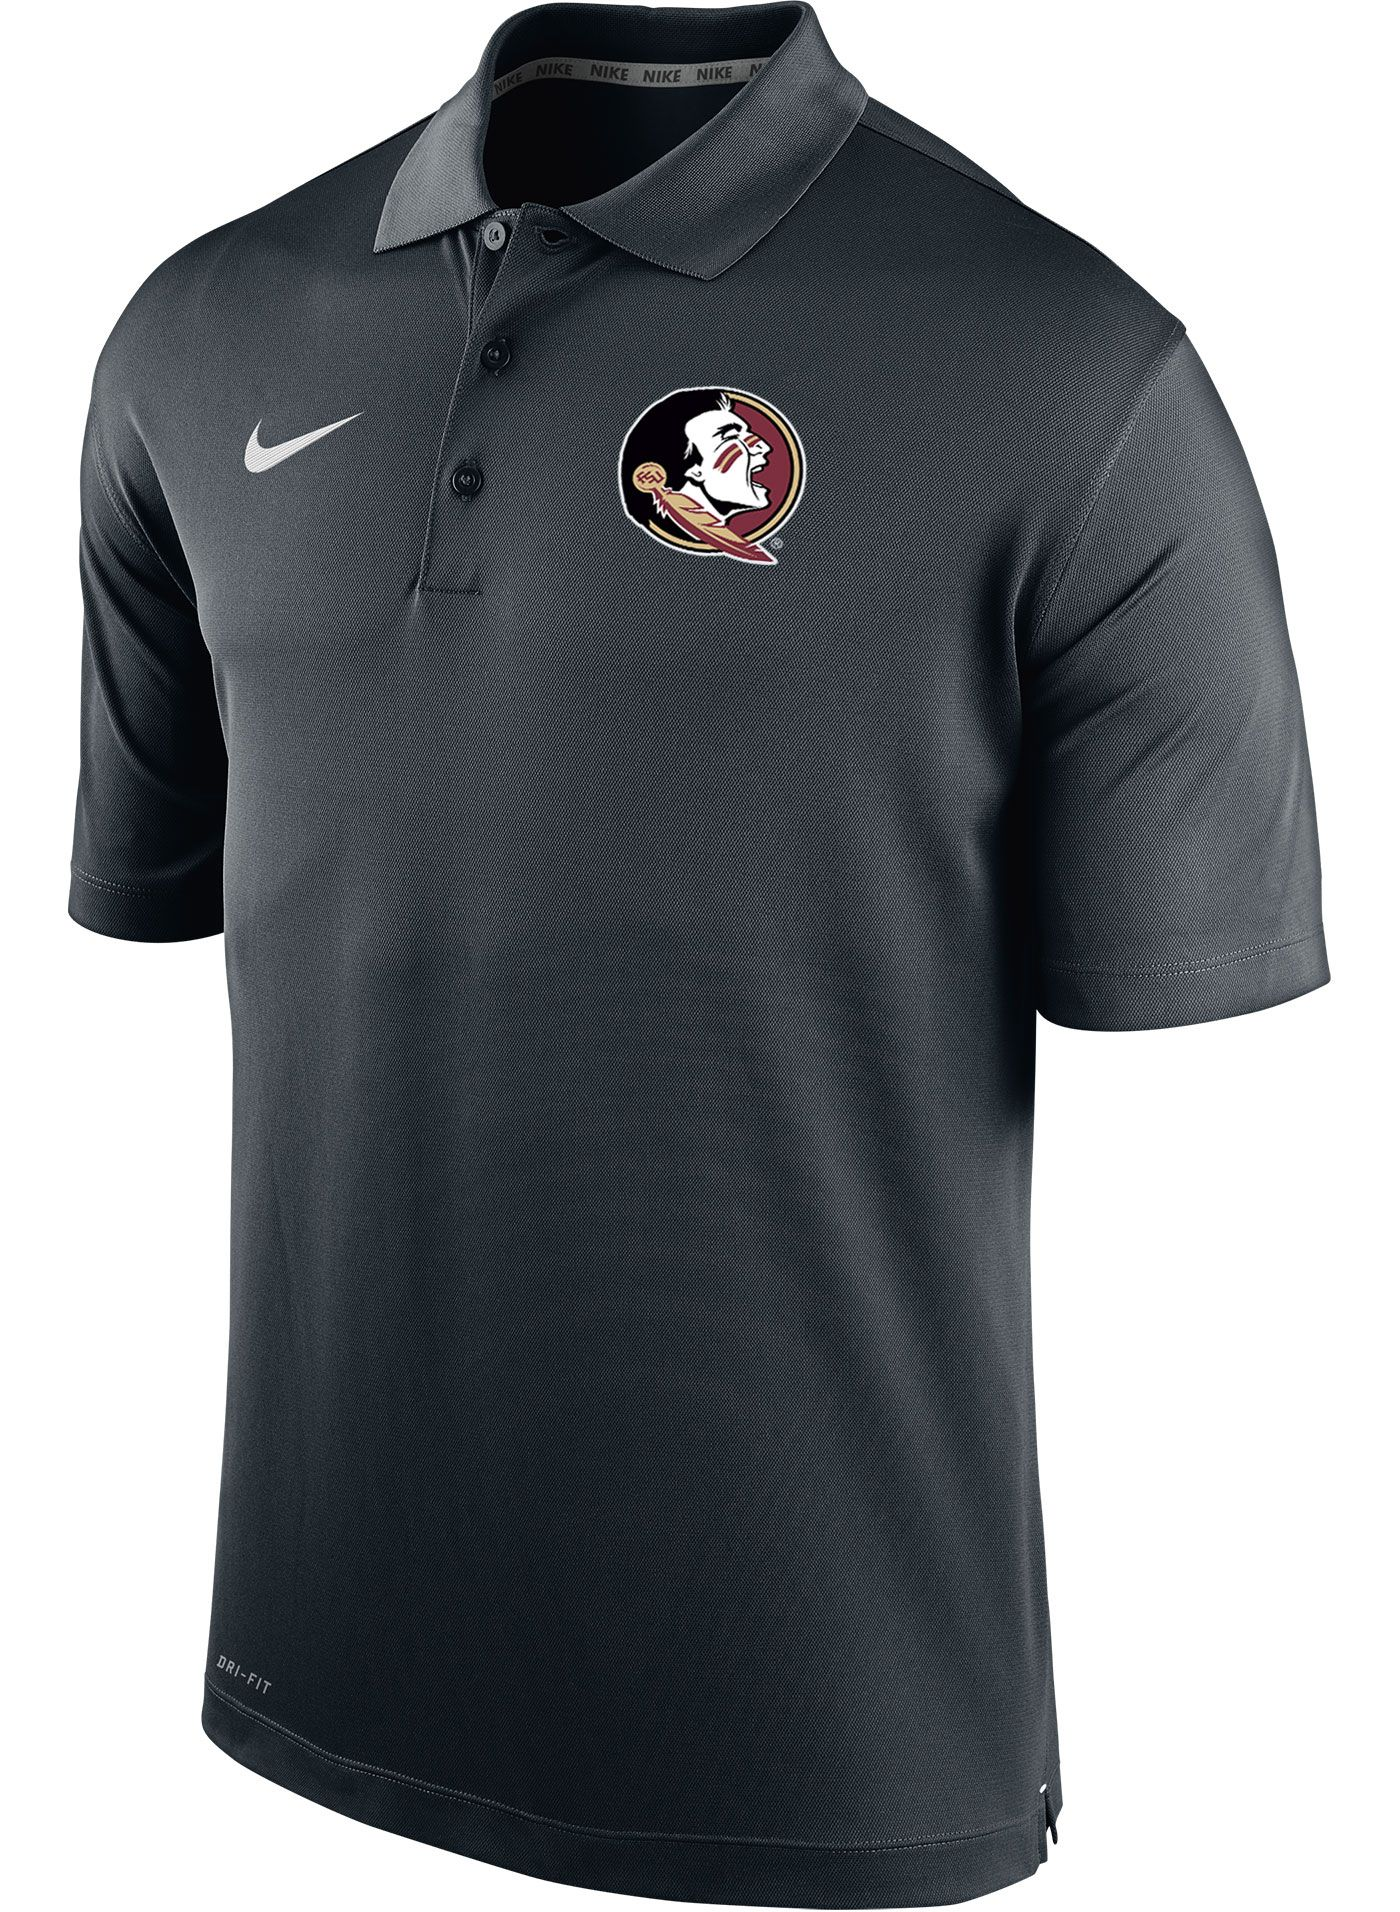 Nike Men's Florida State Seminoles Varsity Black Polo